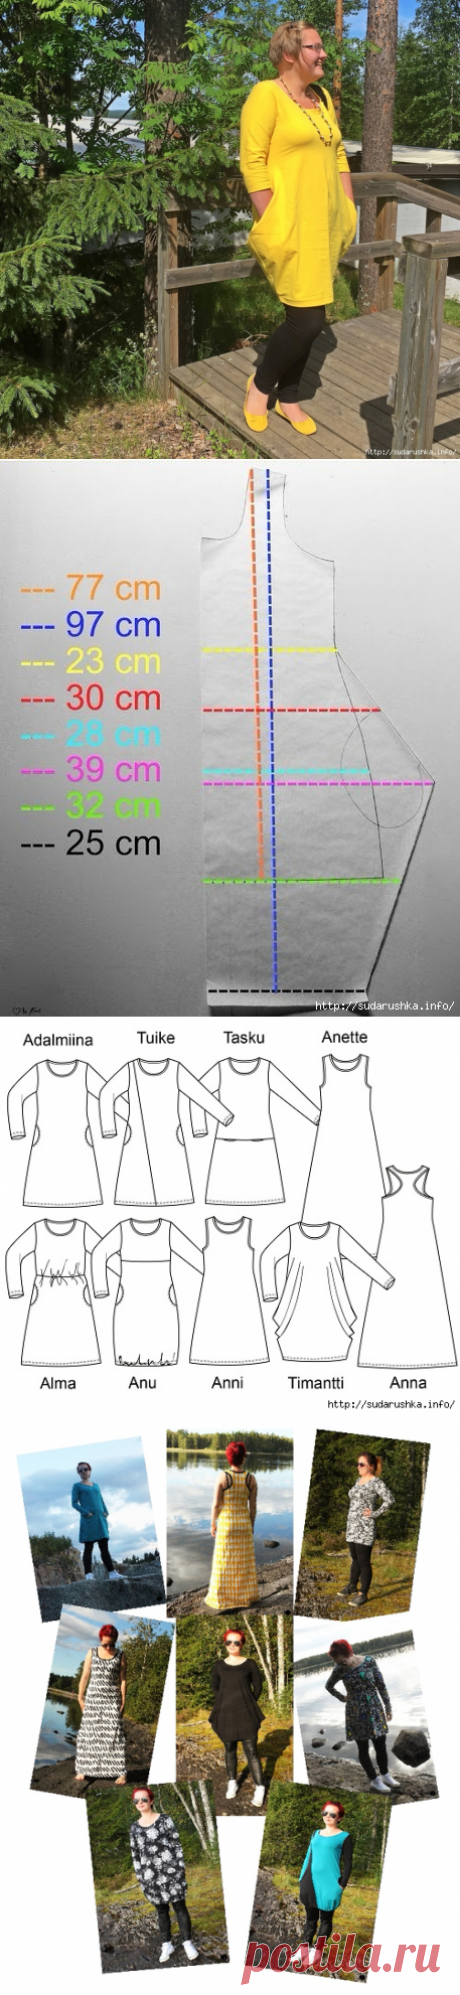 Women's dress, EUR 32-56 sizes. Several options